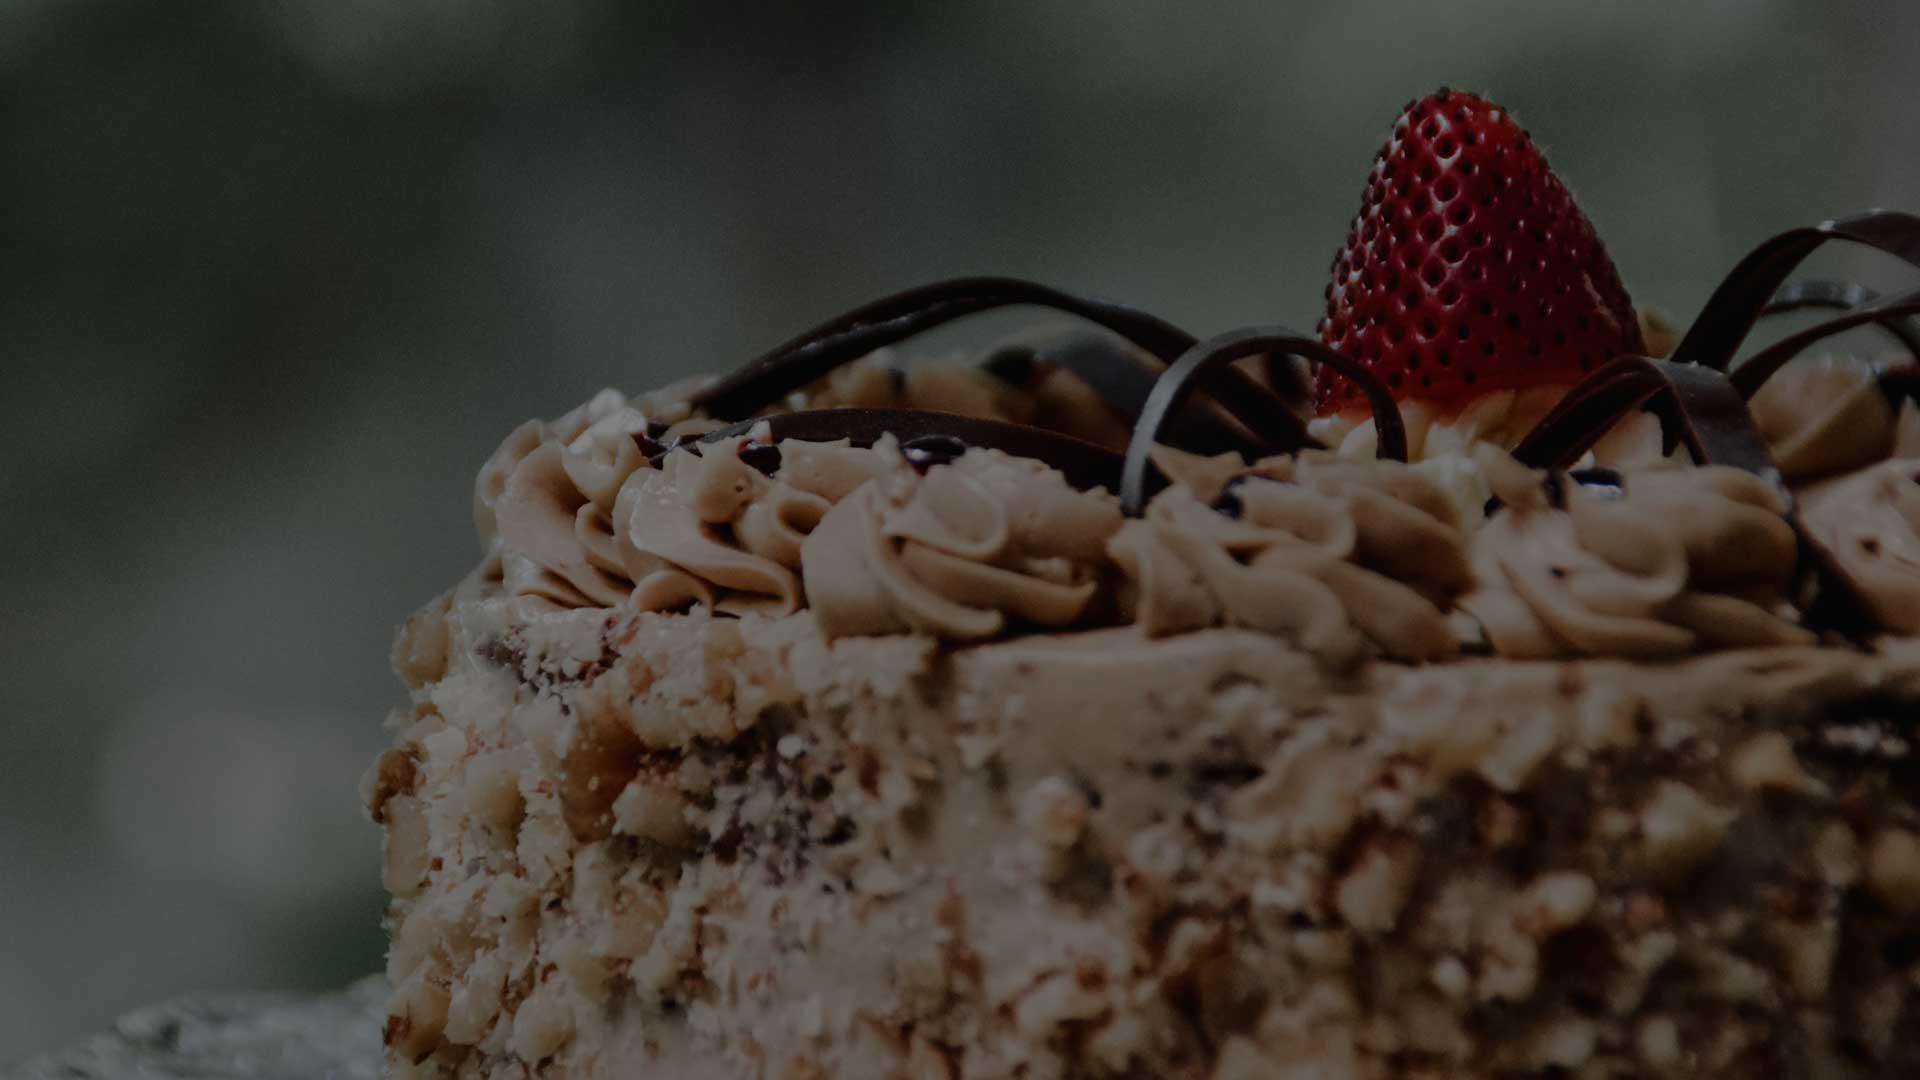 foodjoy-sweet-bakery-laboratorio-pasticceria-cantu-brioches-pasticcini-torte-caffe-torta-gelato